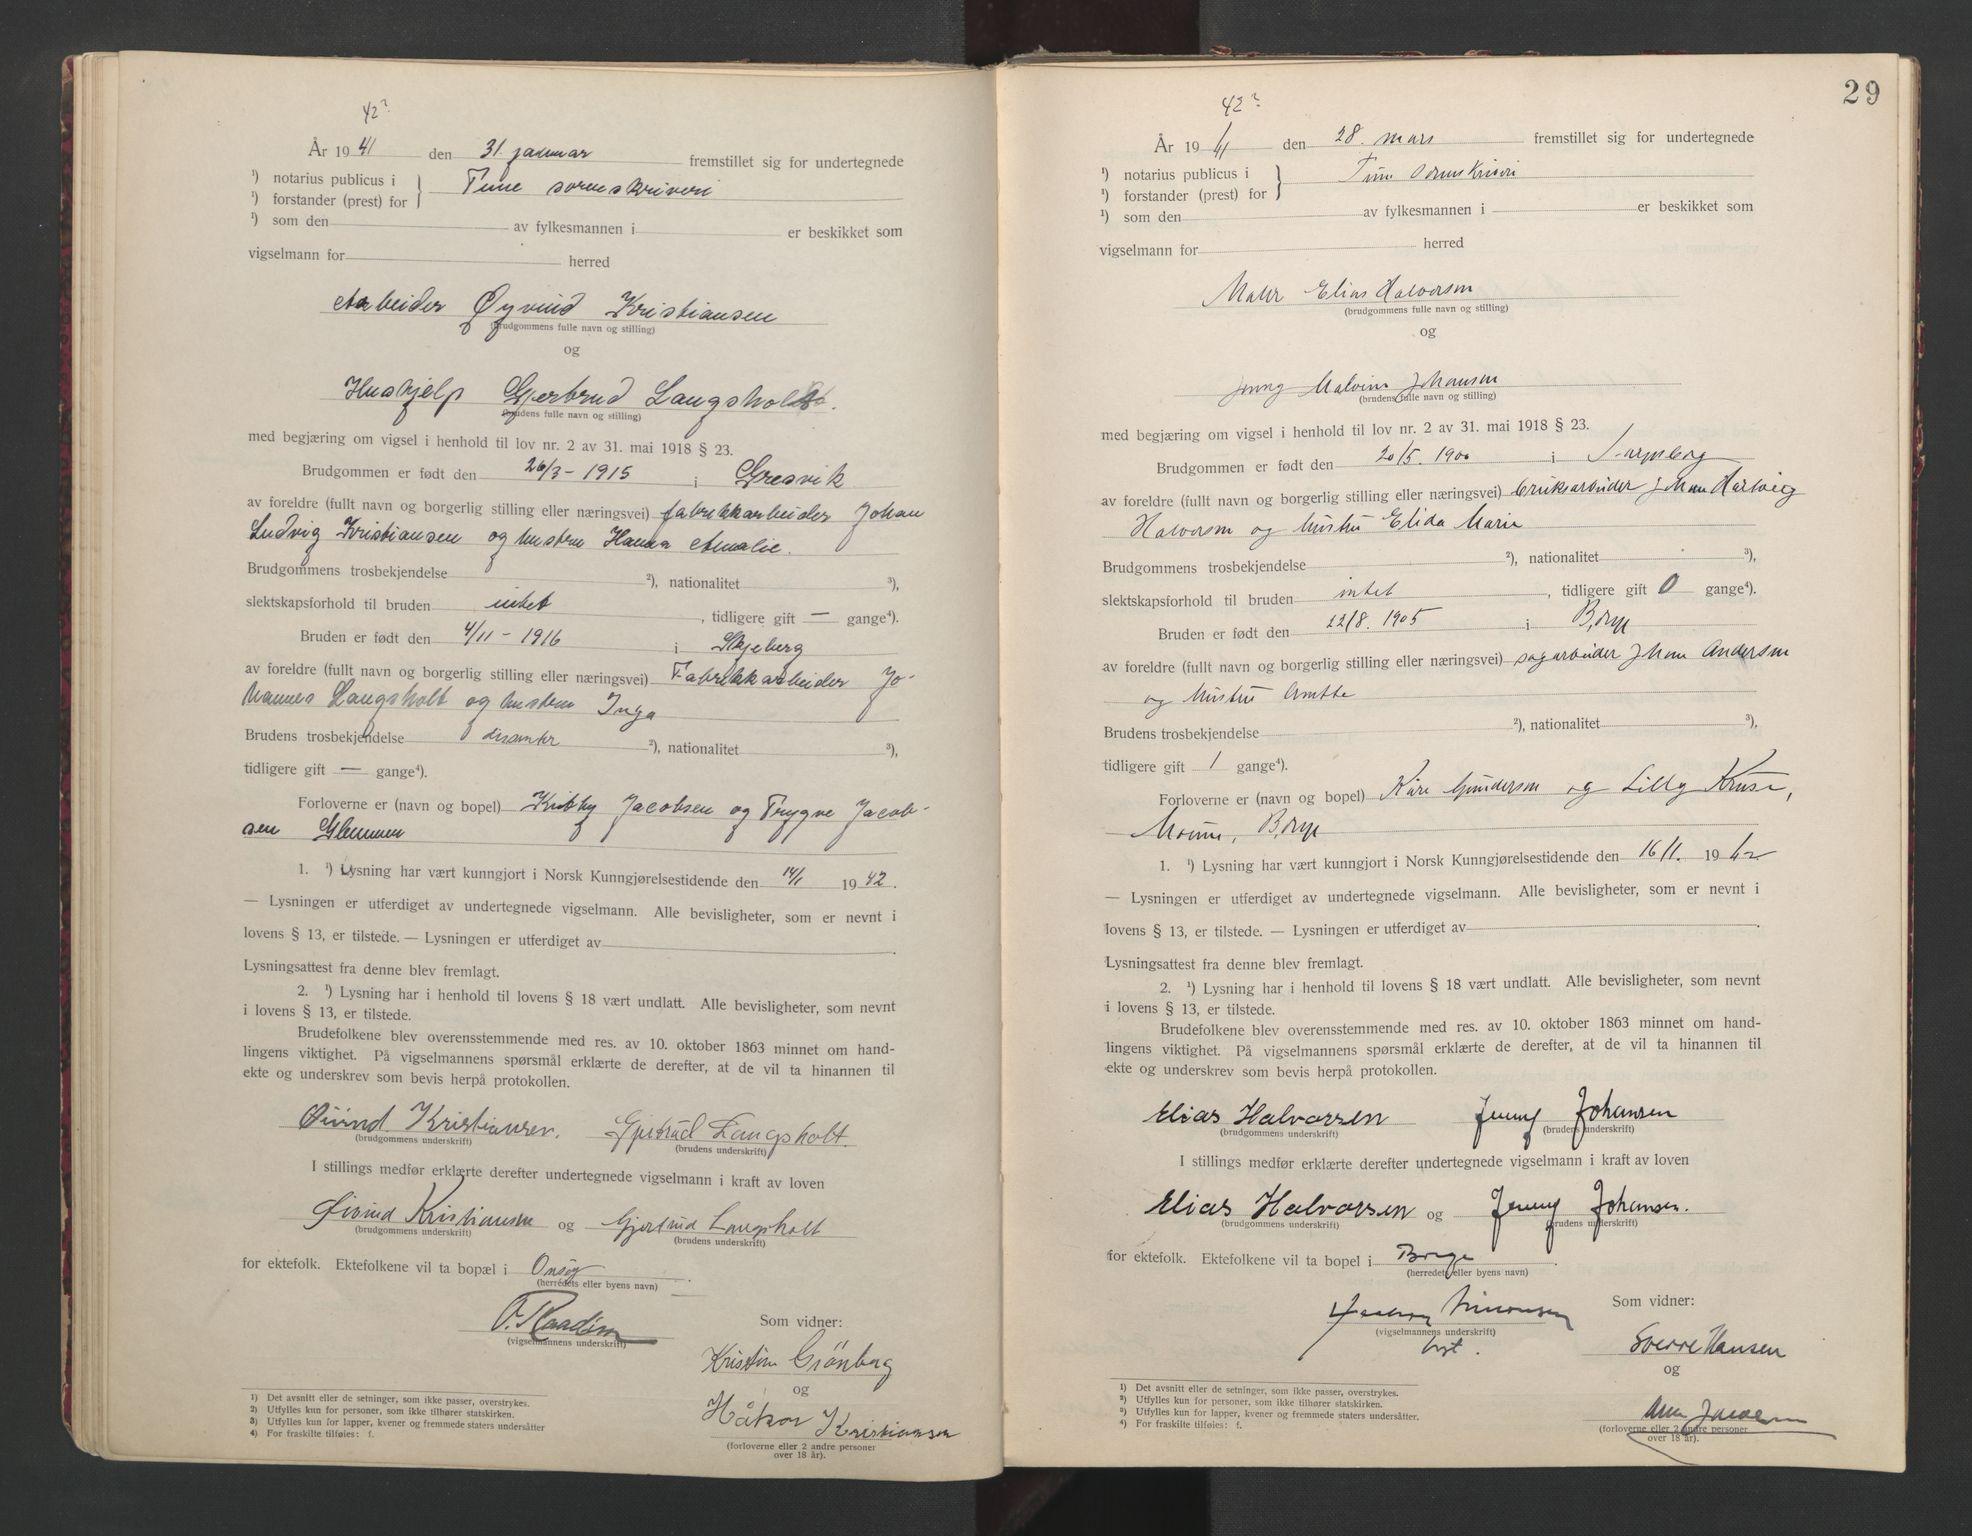 SAO, Tune sorenskriveri, L/Lb/L0001: Vigselprotokoll, 1923-1943, s. 29